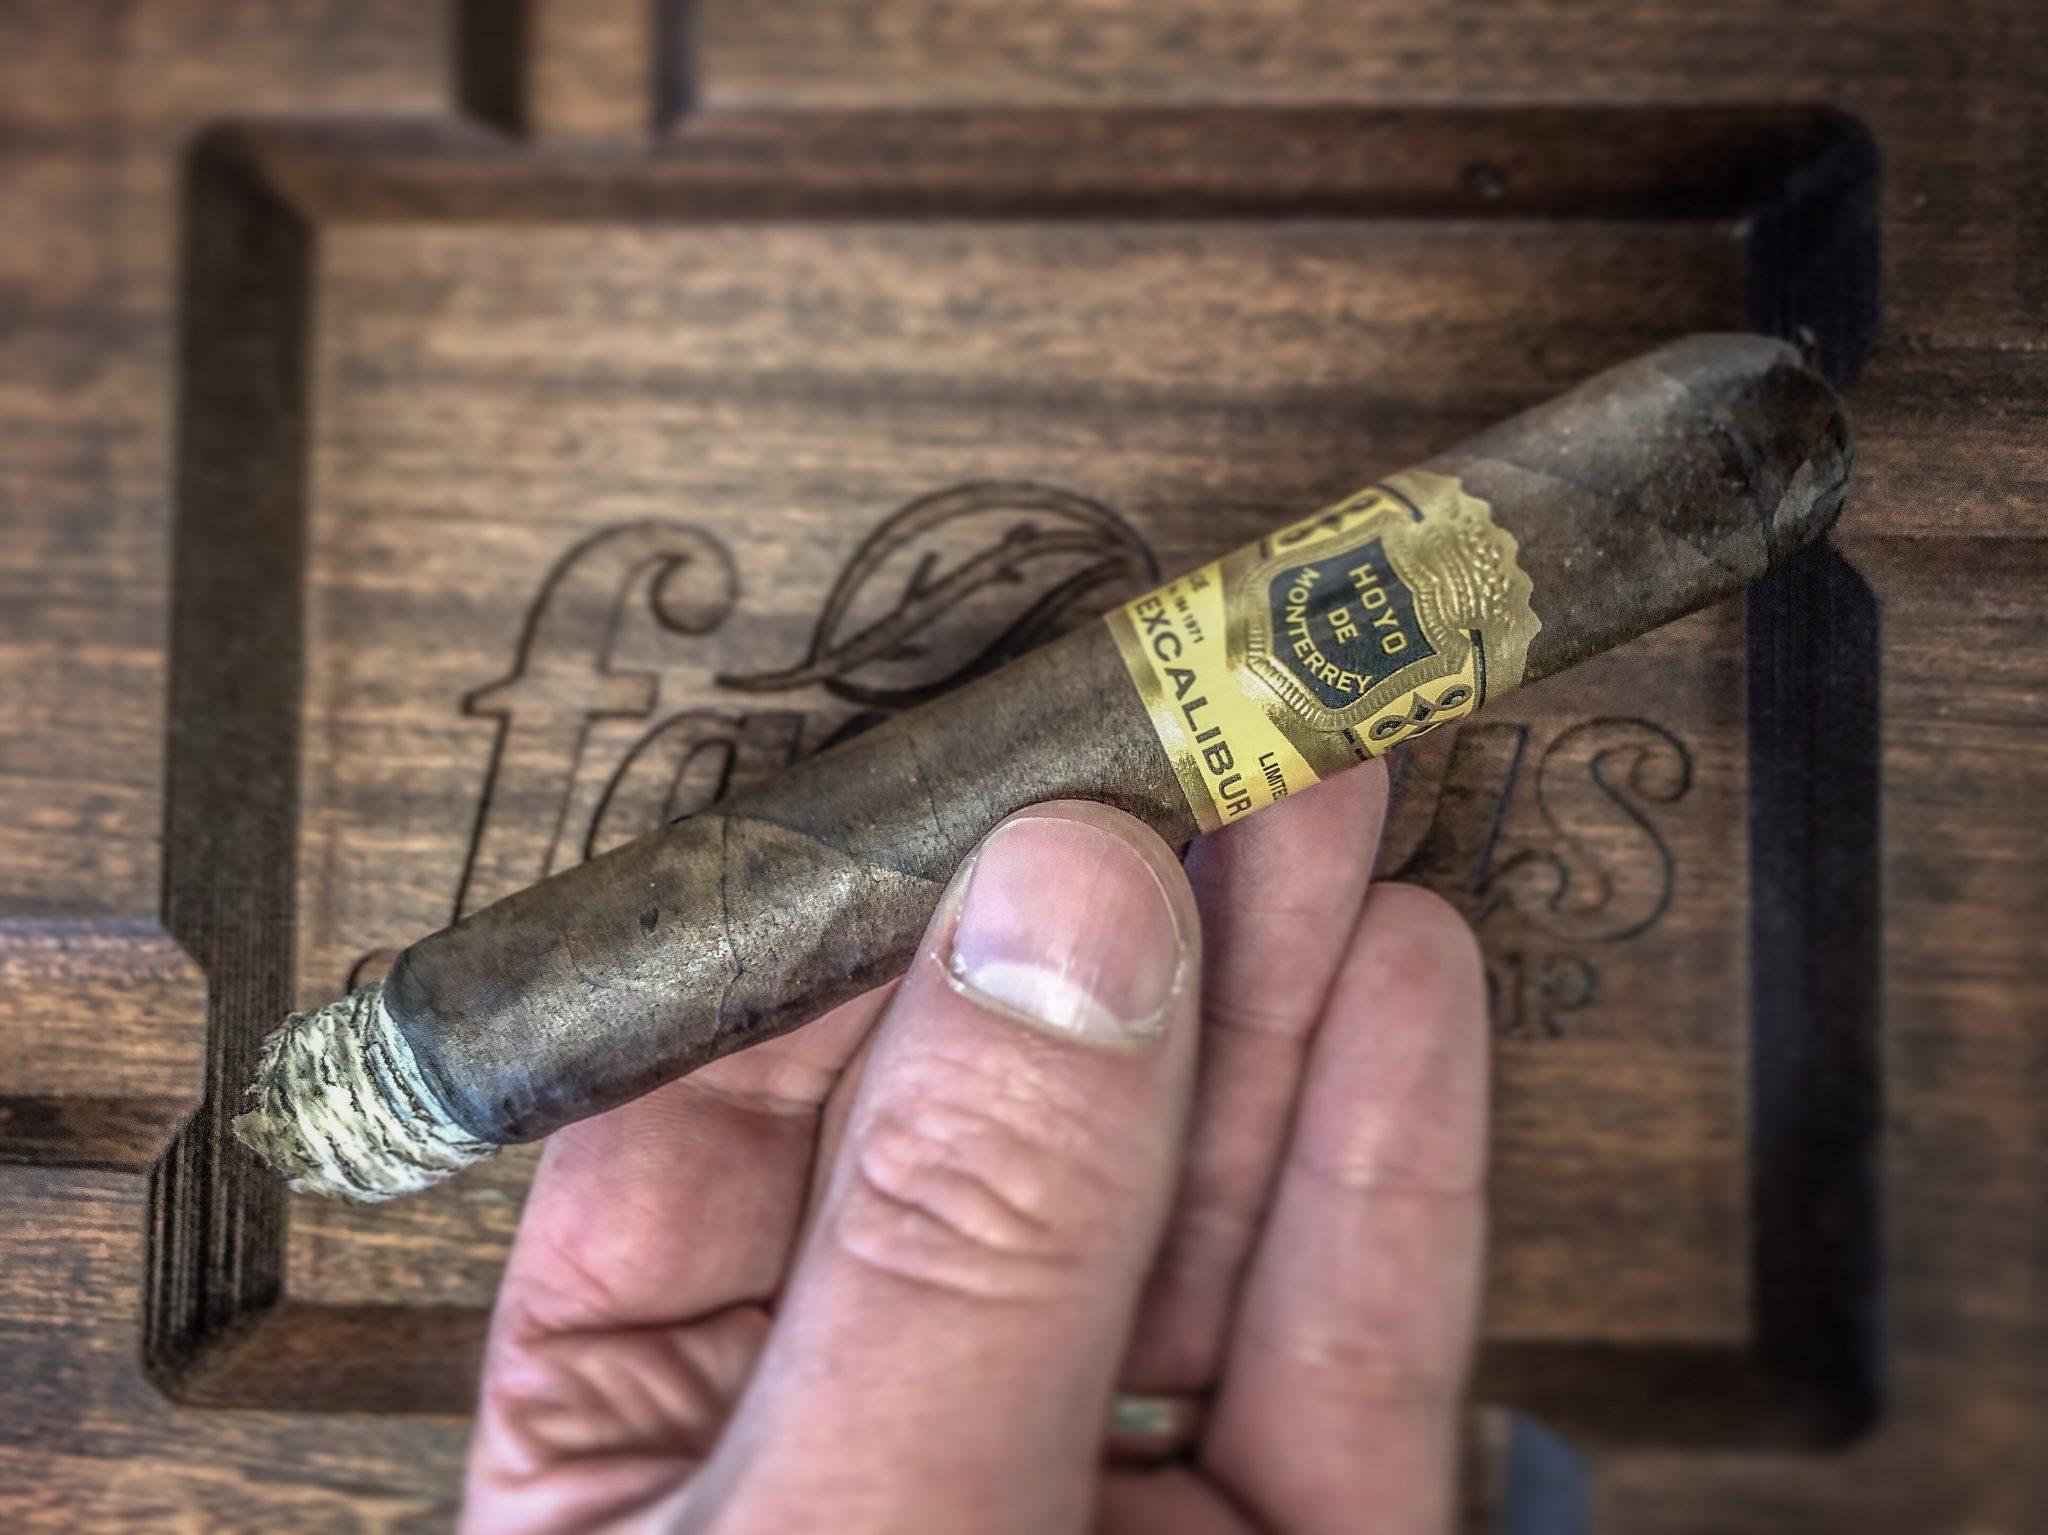 hoyo de monterrey cigars guide excalibur cigars hdm excalibur maduro cigar review by Jared Gulick